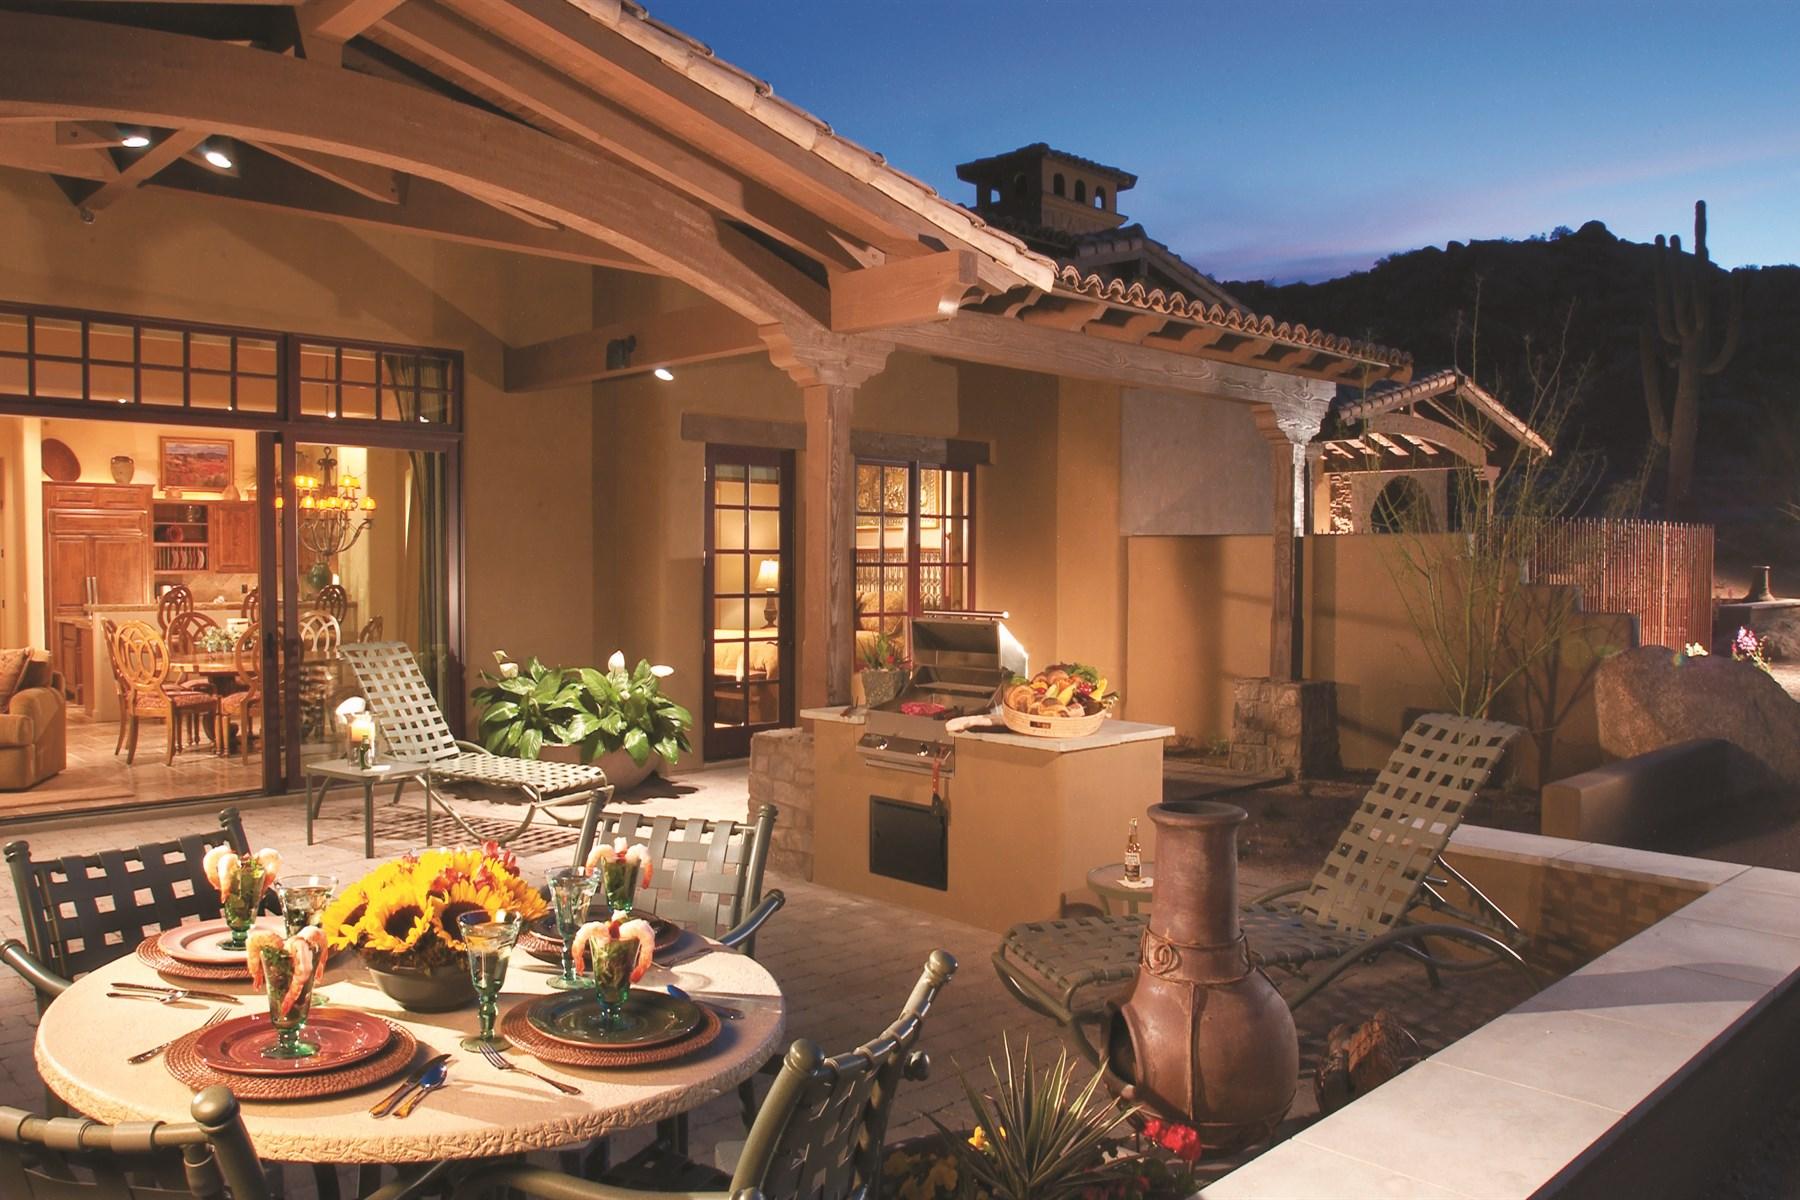 sales property at Villa 111 is a fully furnished 3-bedroom/3 bath Villa at The Rocks